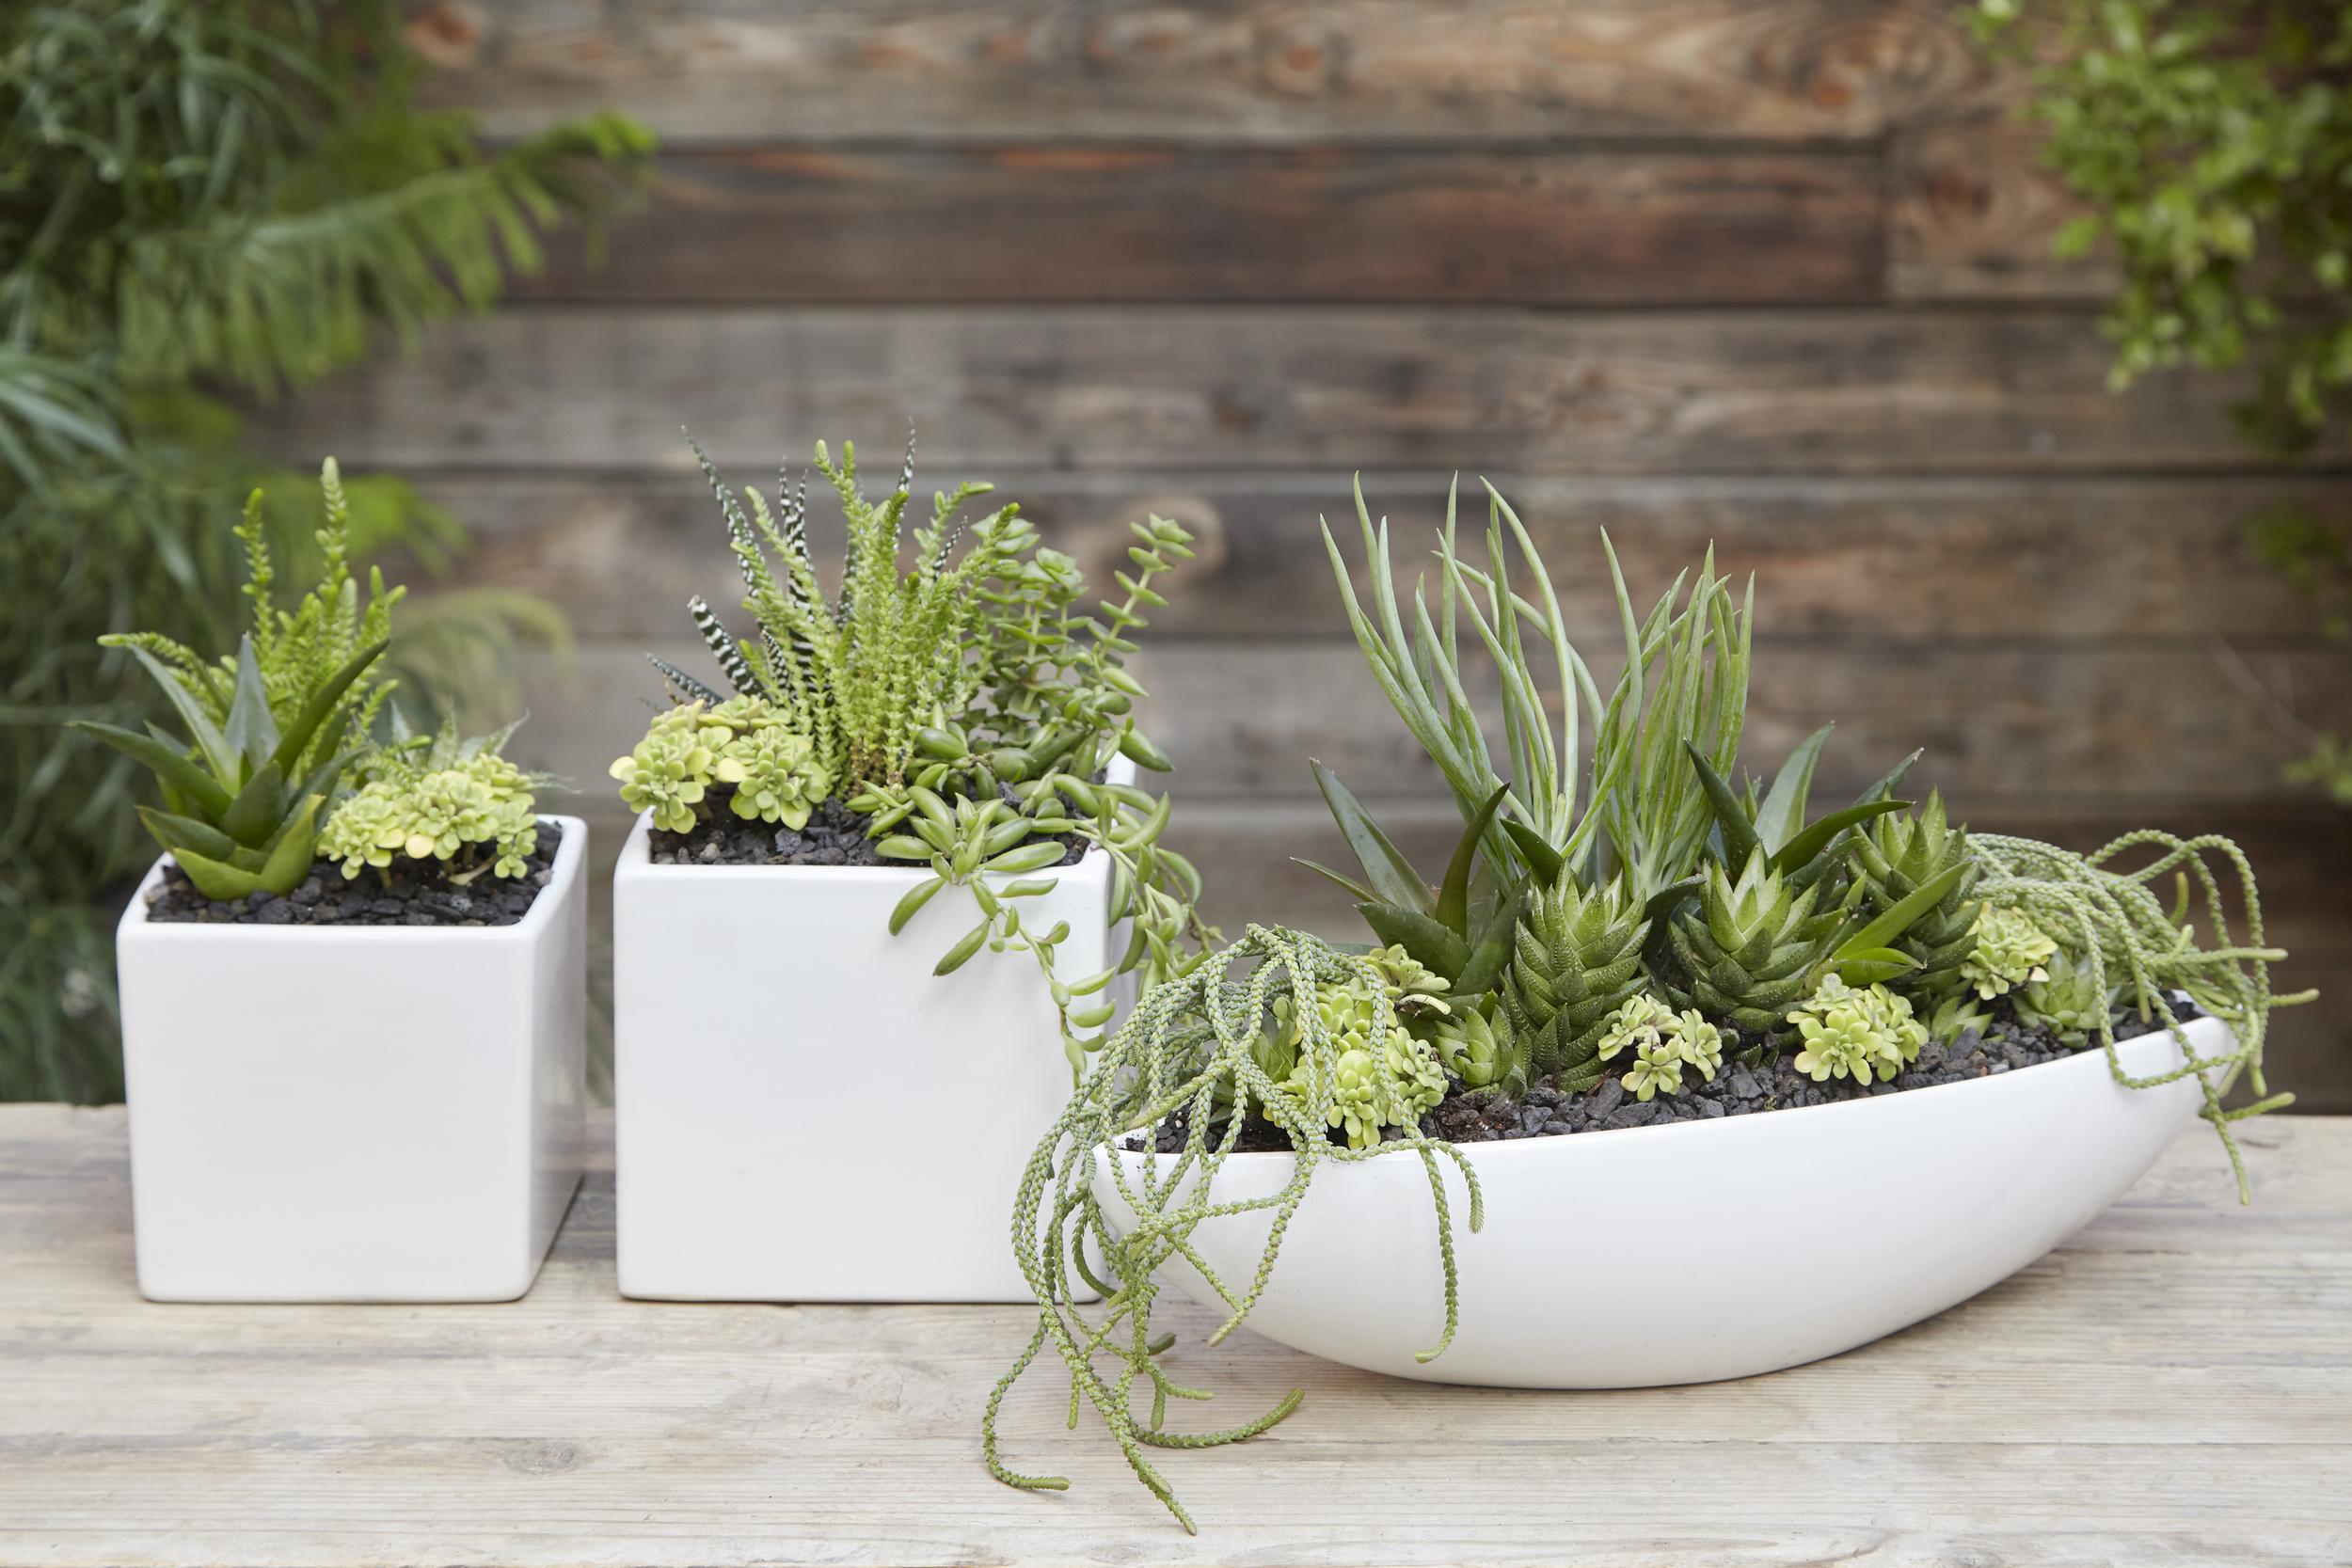 Flora Grubb Gardens Potting Bench DIY Gifts